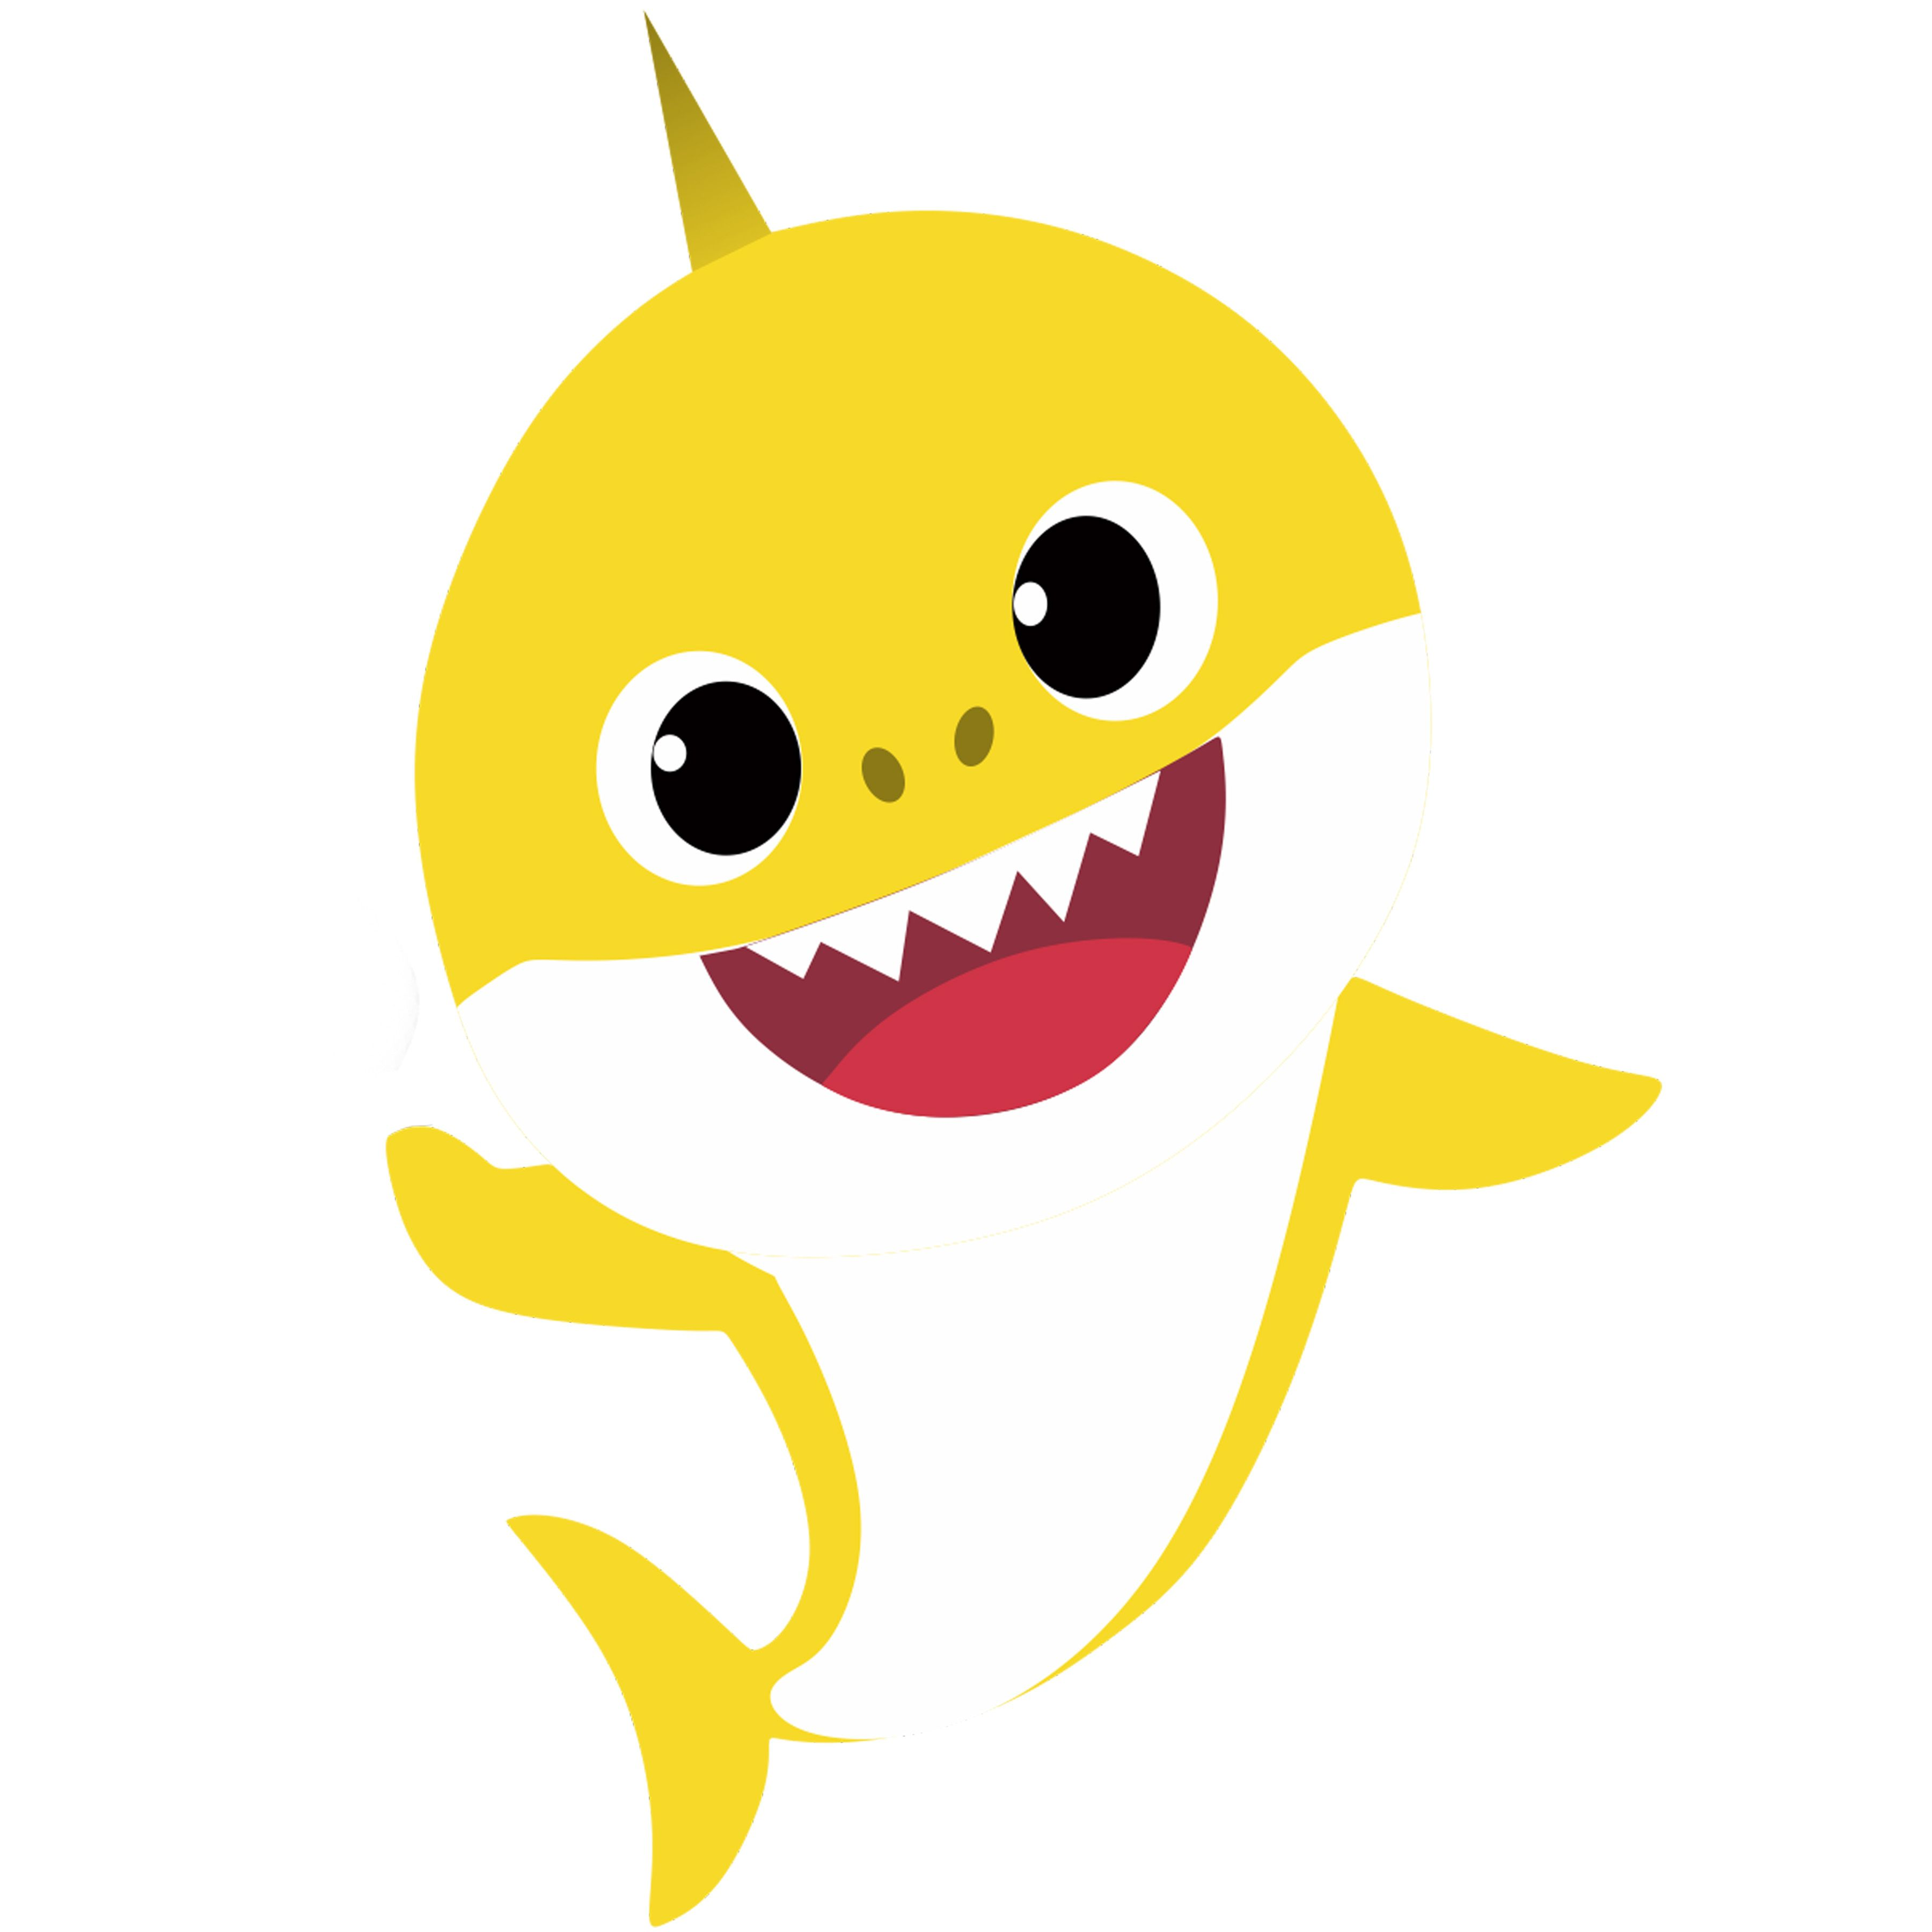 BabyShark #SharkFamily #mommyshark #daddyshark in 2019.